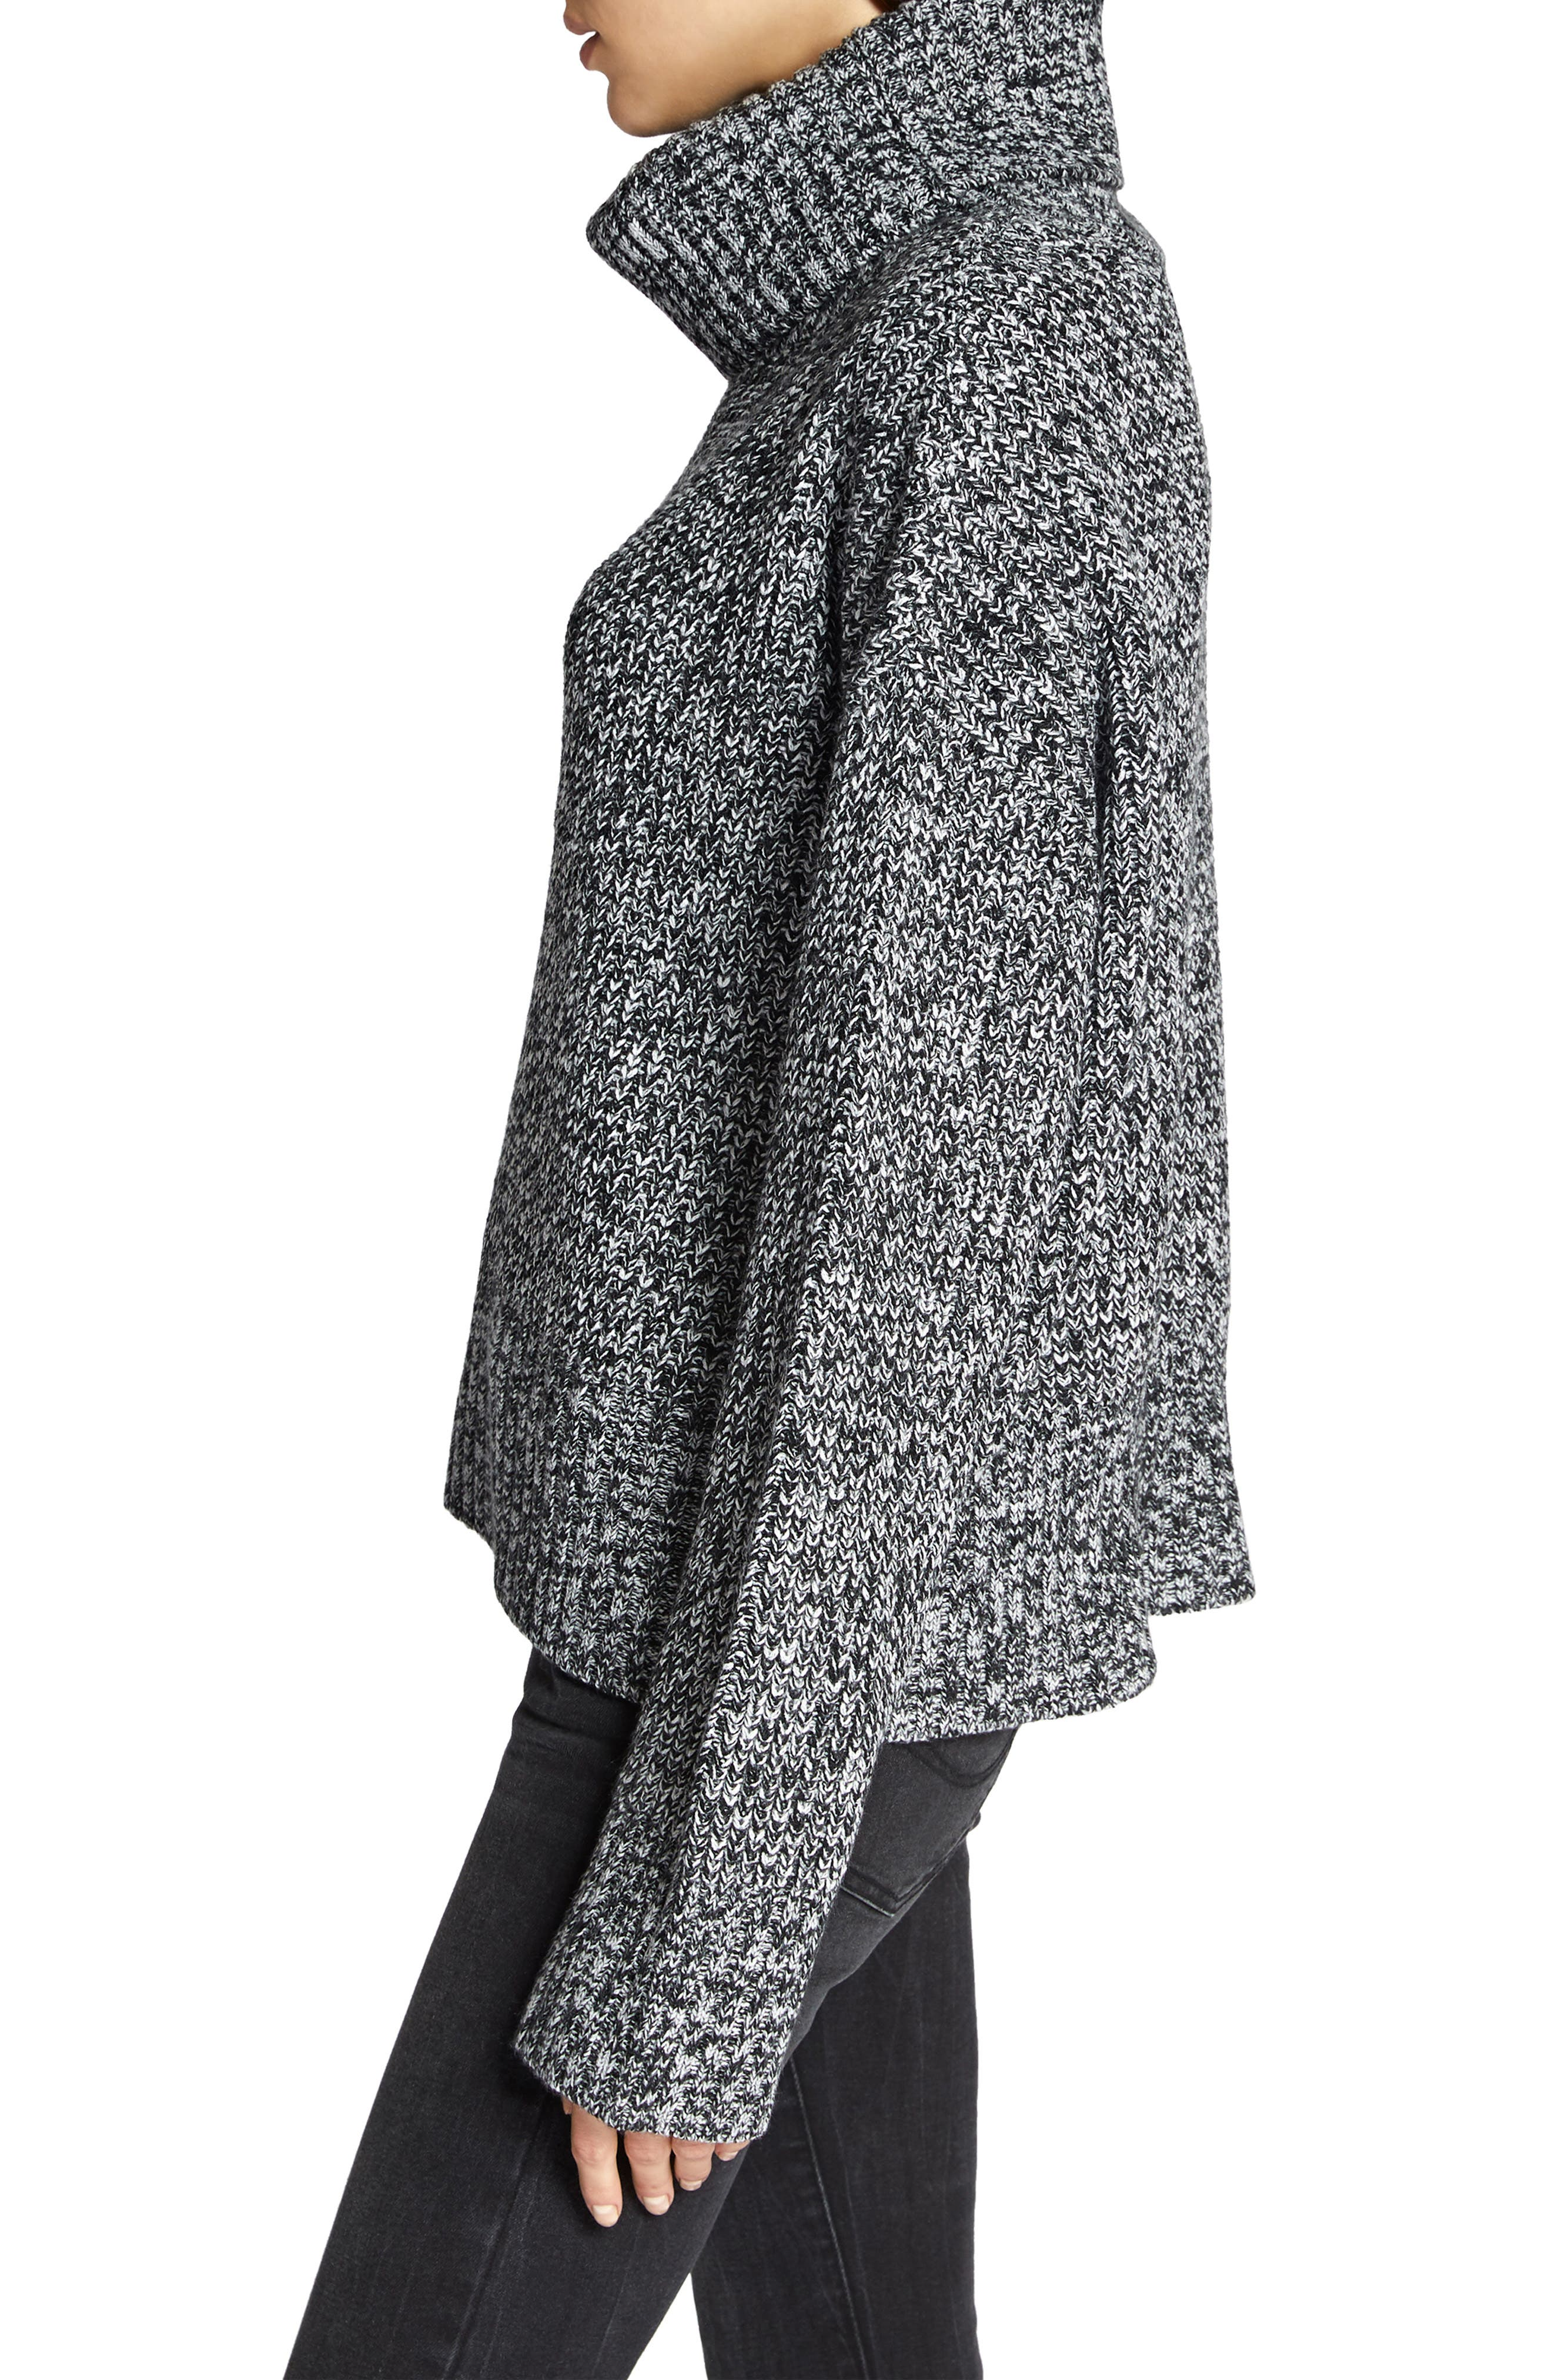 Cowl Neck Shaker Sweater,                             Alternate thumbnail 3, color,                             BLACK/ WINTER